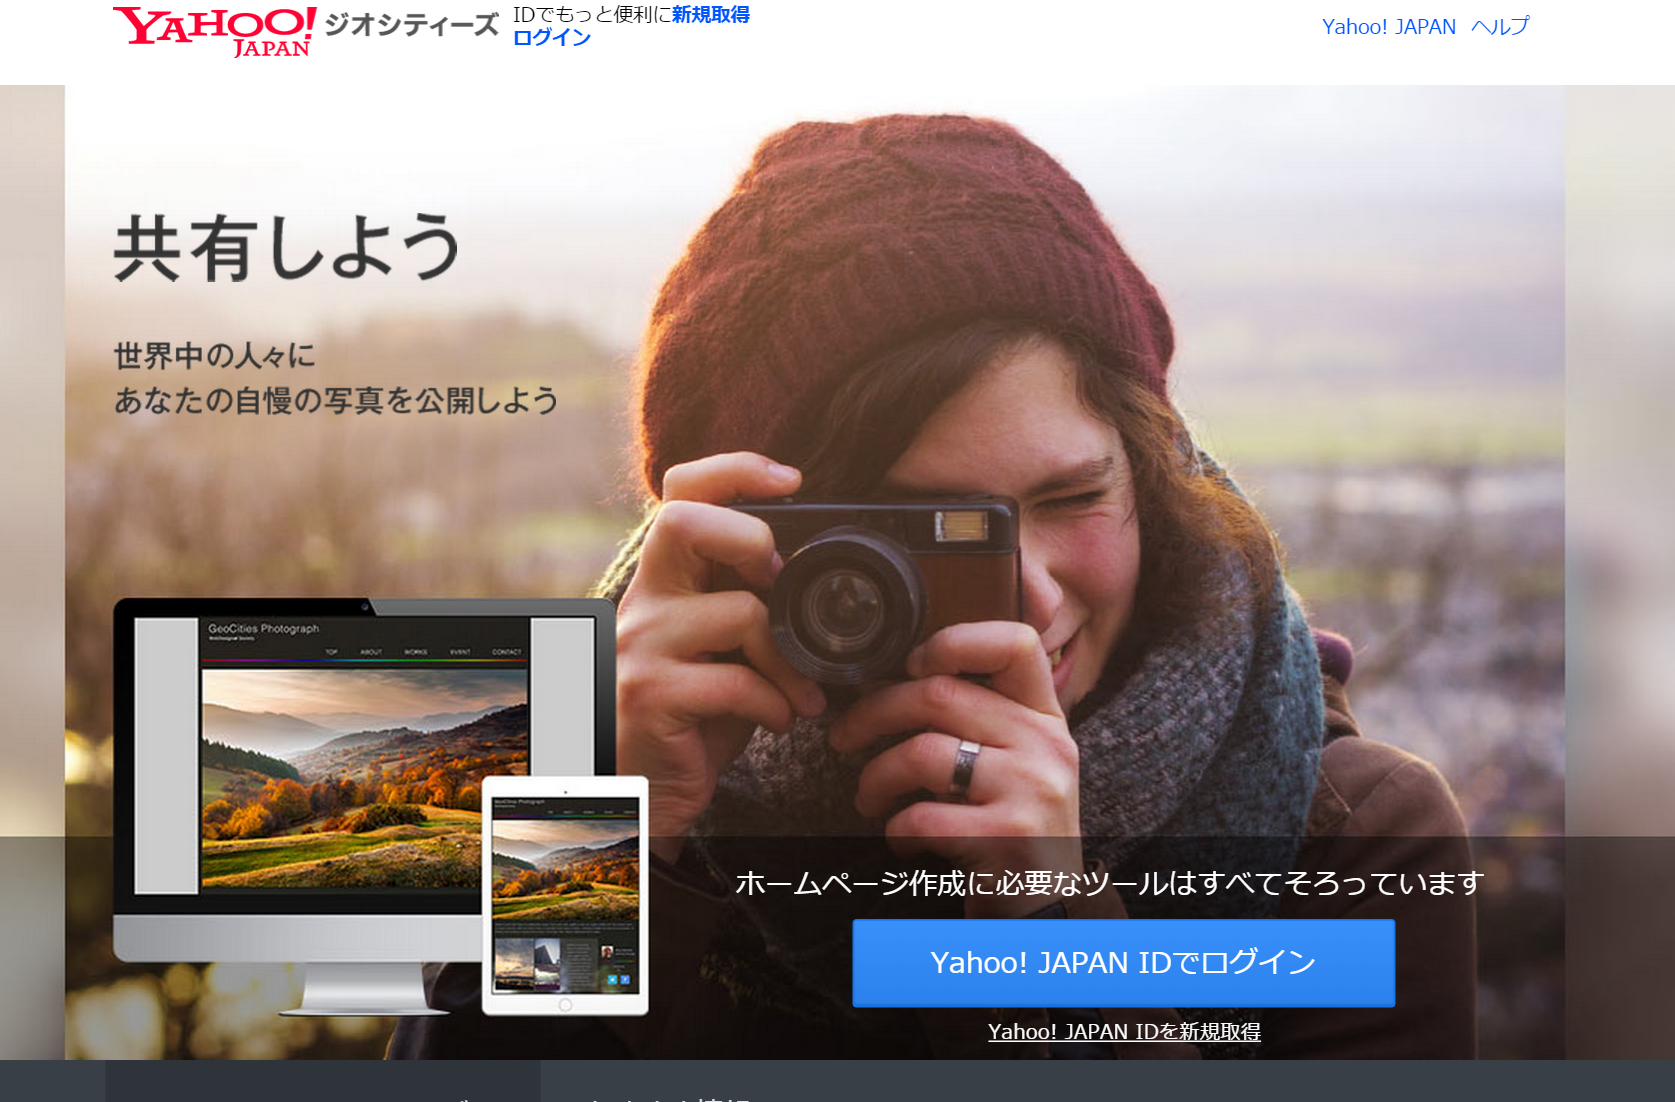 SnapCrab_NoName_2015-8-29_15-43-41_No-00